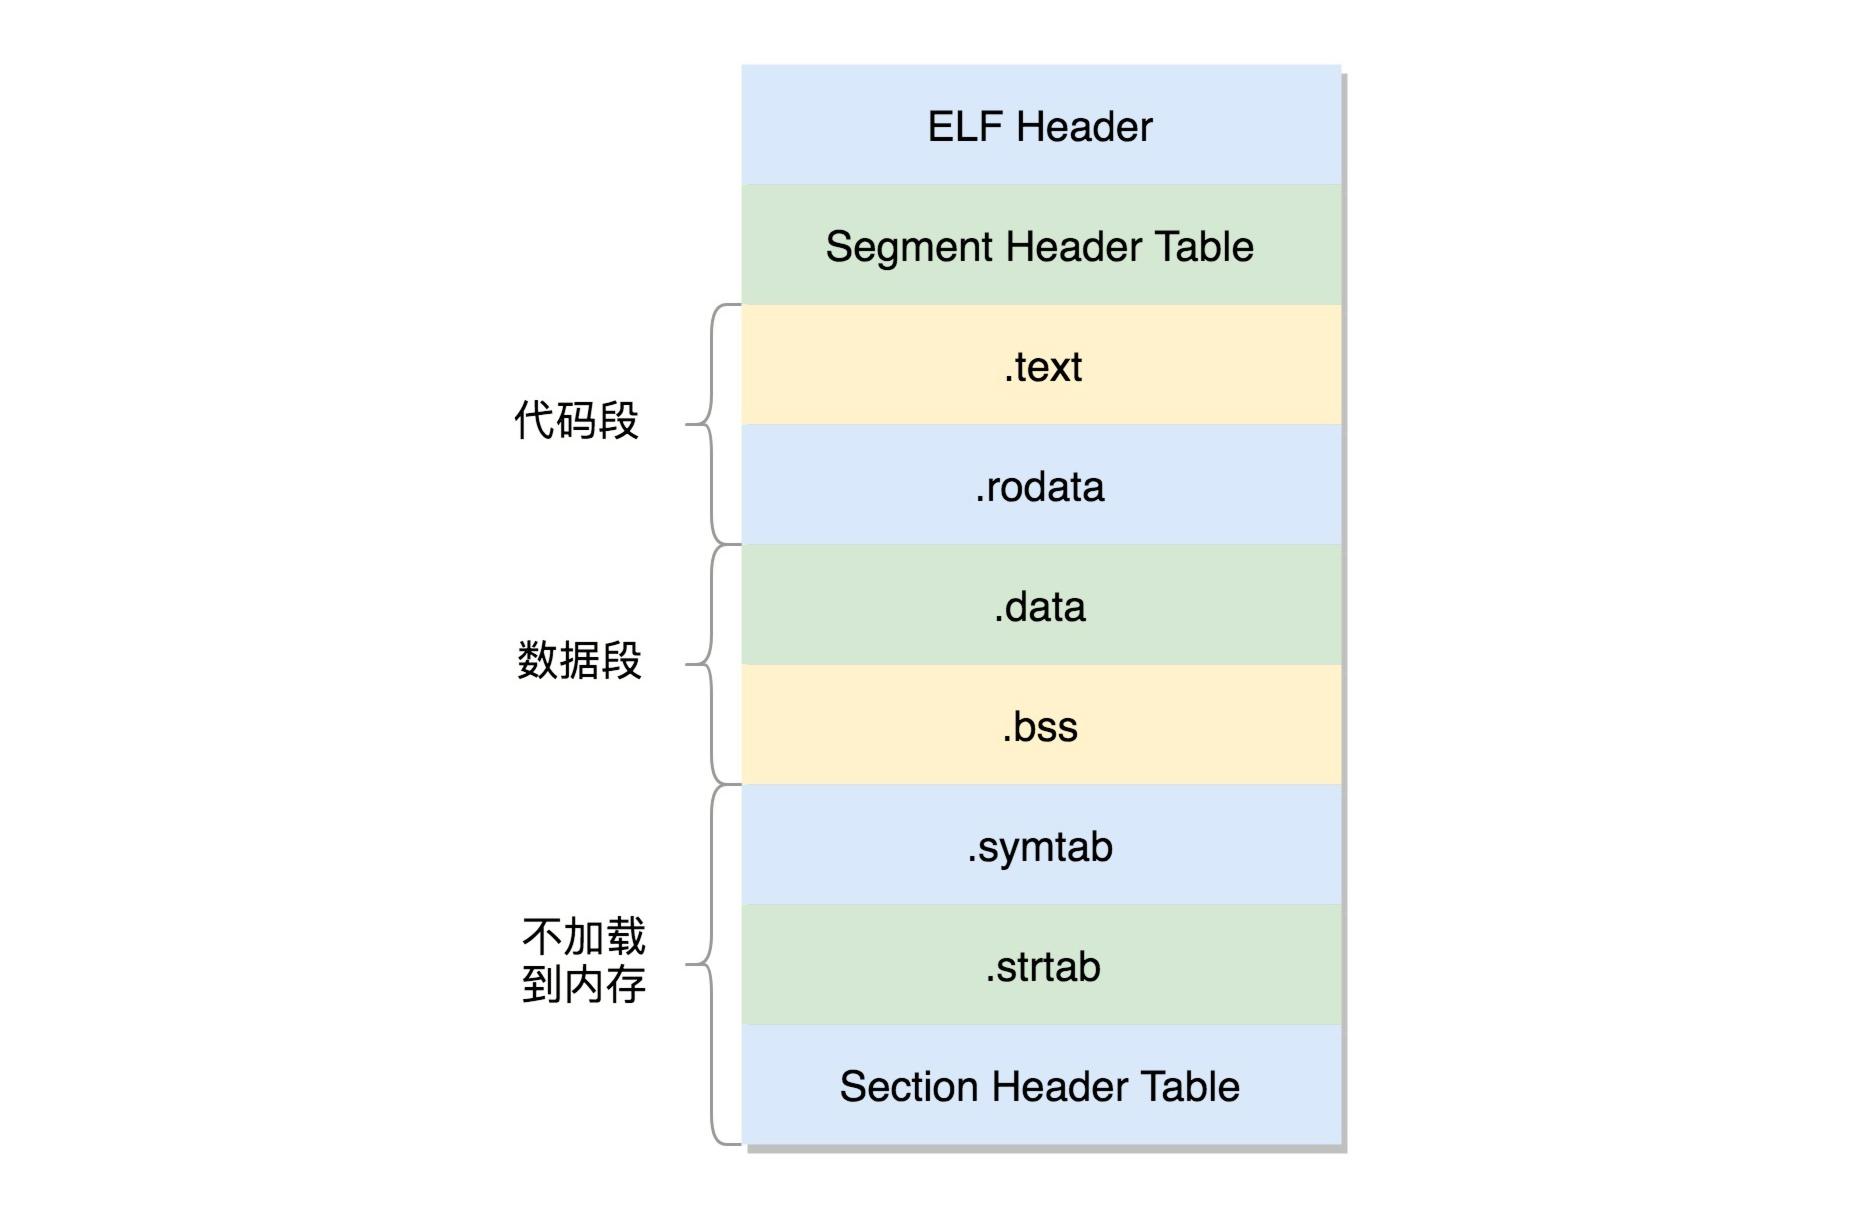 https://img.madebug.net/m4d3bug/images-of-website/master/blog/executableFileFormat.jpg